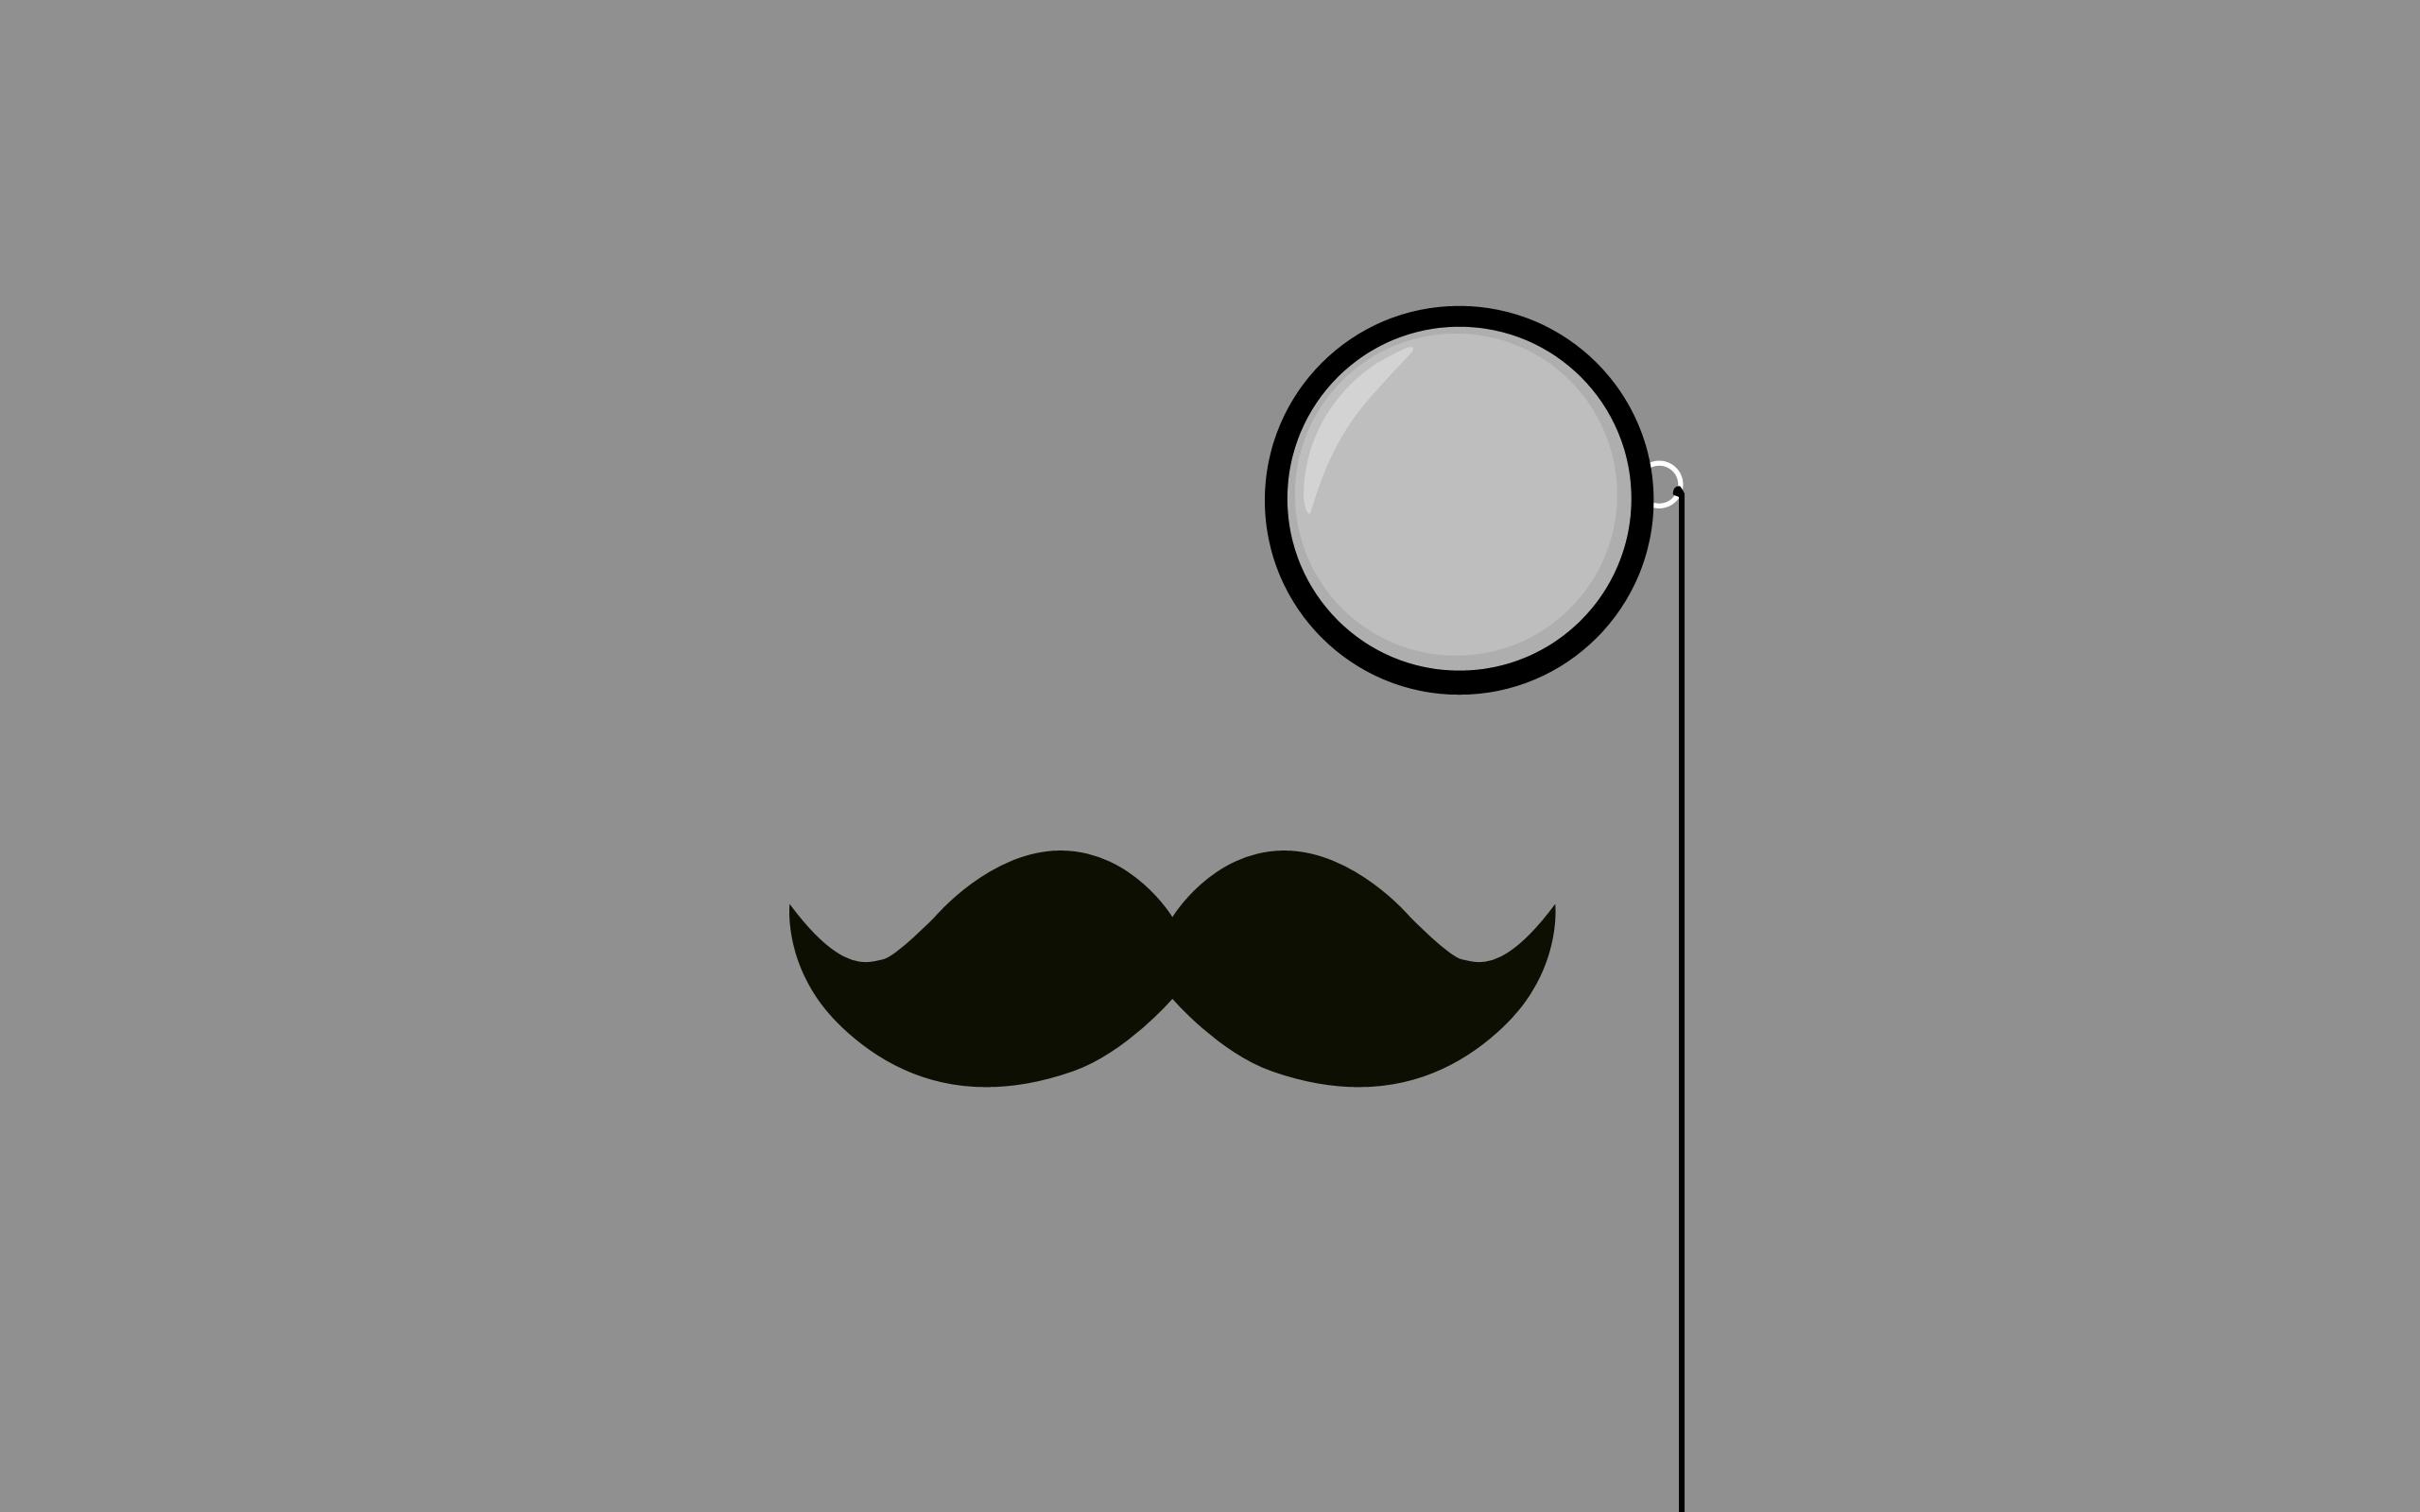 404 Not Found Mustache Wallpaper Moustache Classy Wallpaper